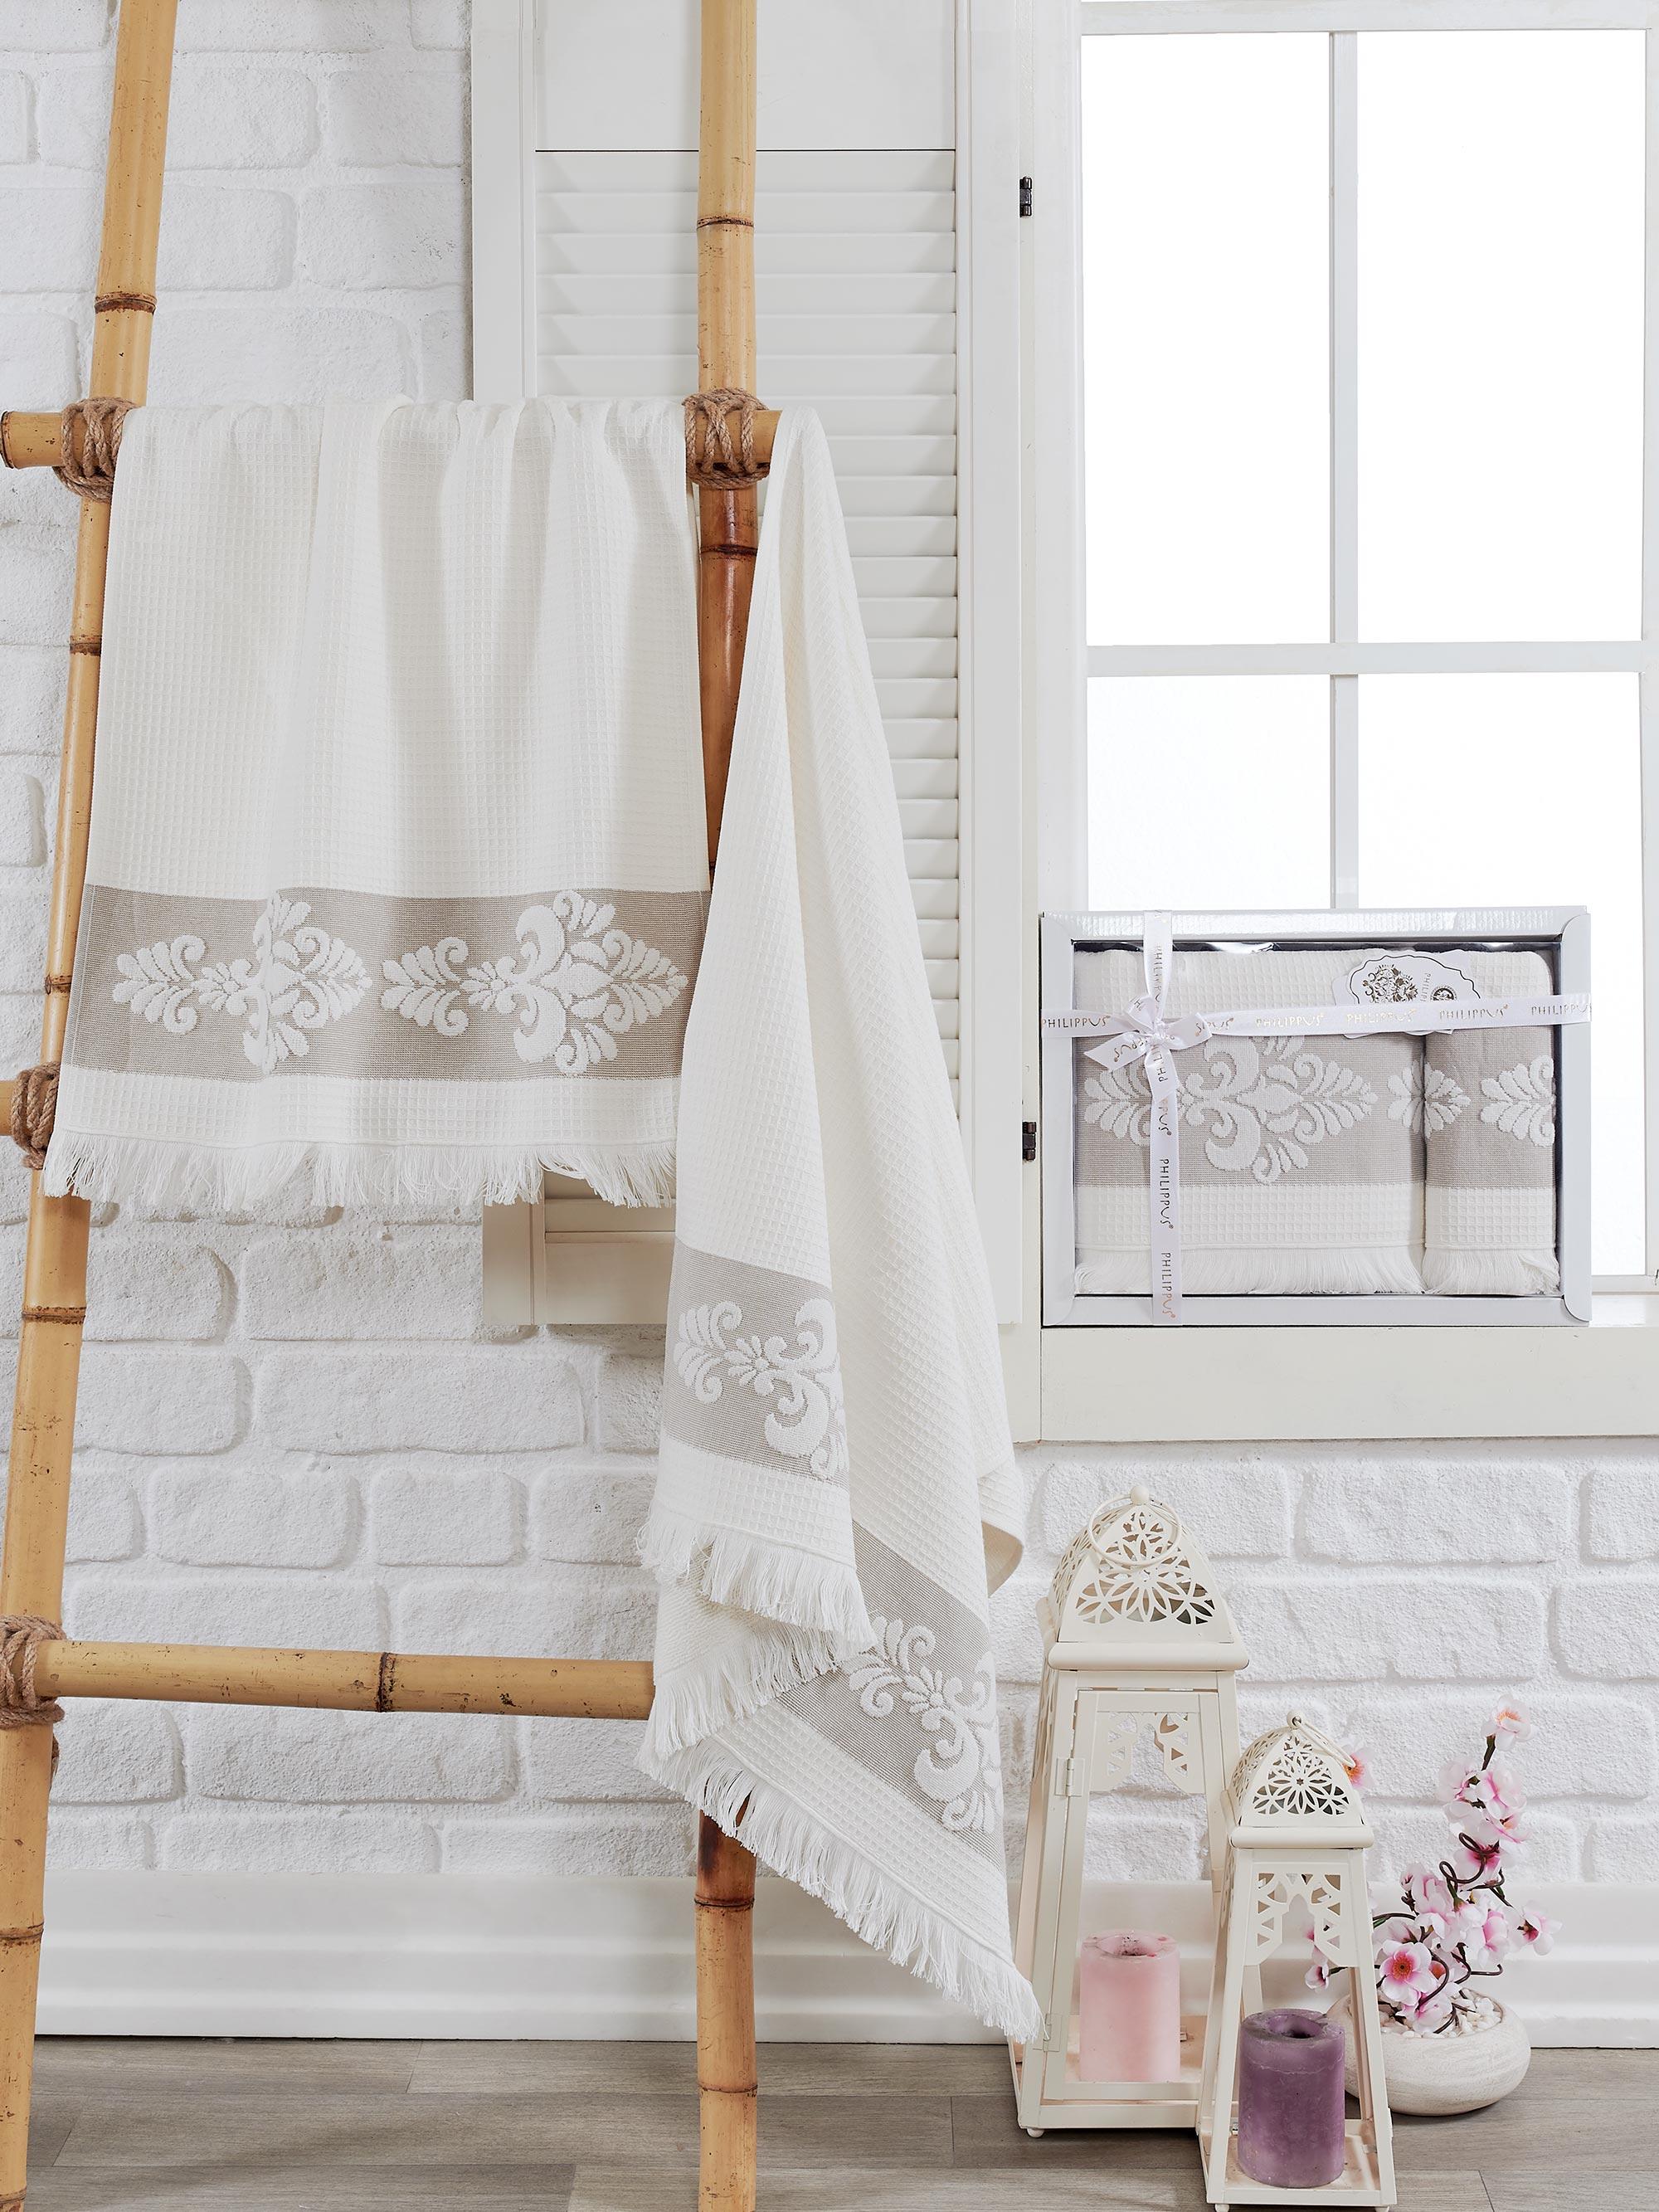 Полотенца Philippus Полотенце Ahus Цвет: Кремовый (50х90 см,70х140 см) полотенца philippus полотенце maura цвет кремовый 50х90 см